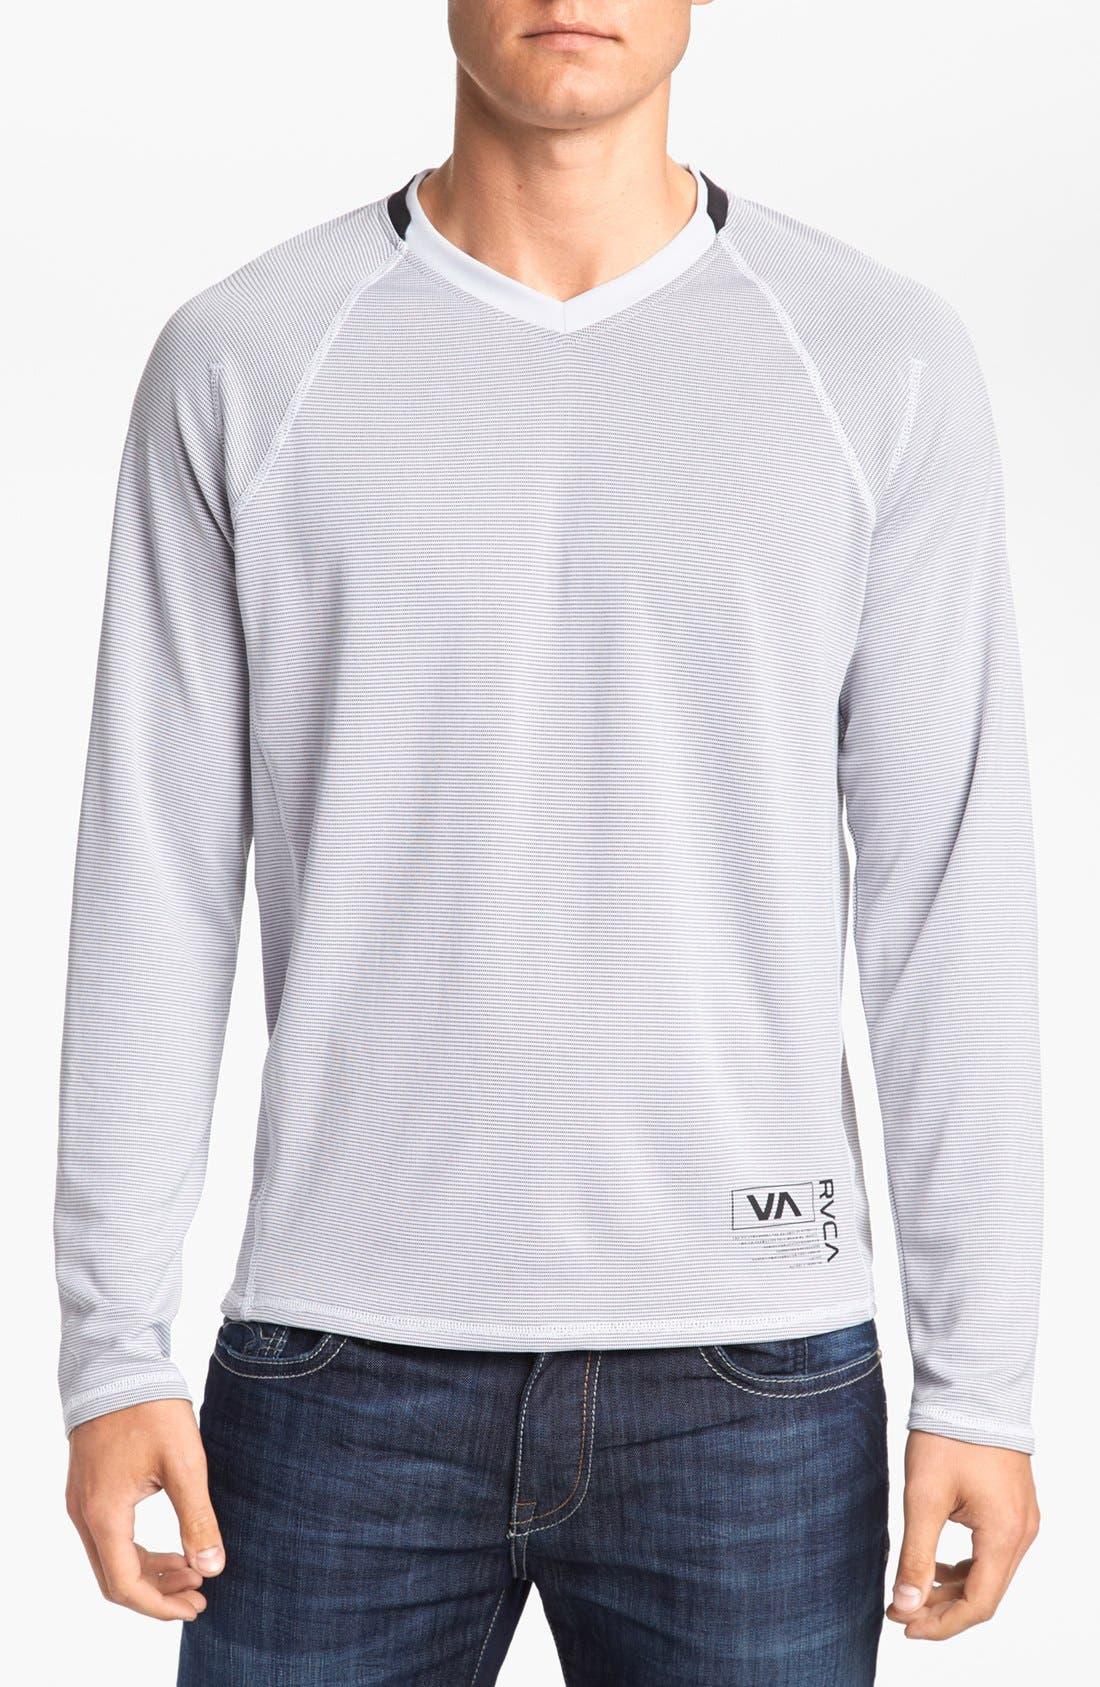 Main Image - RVCA 'Fraction' Long Sleeve V-Neck T-Shirt